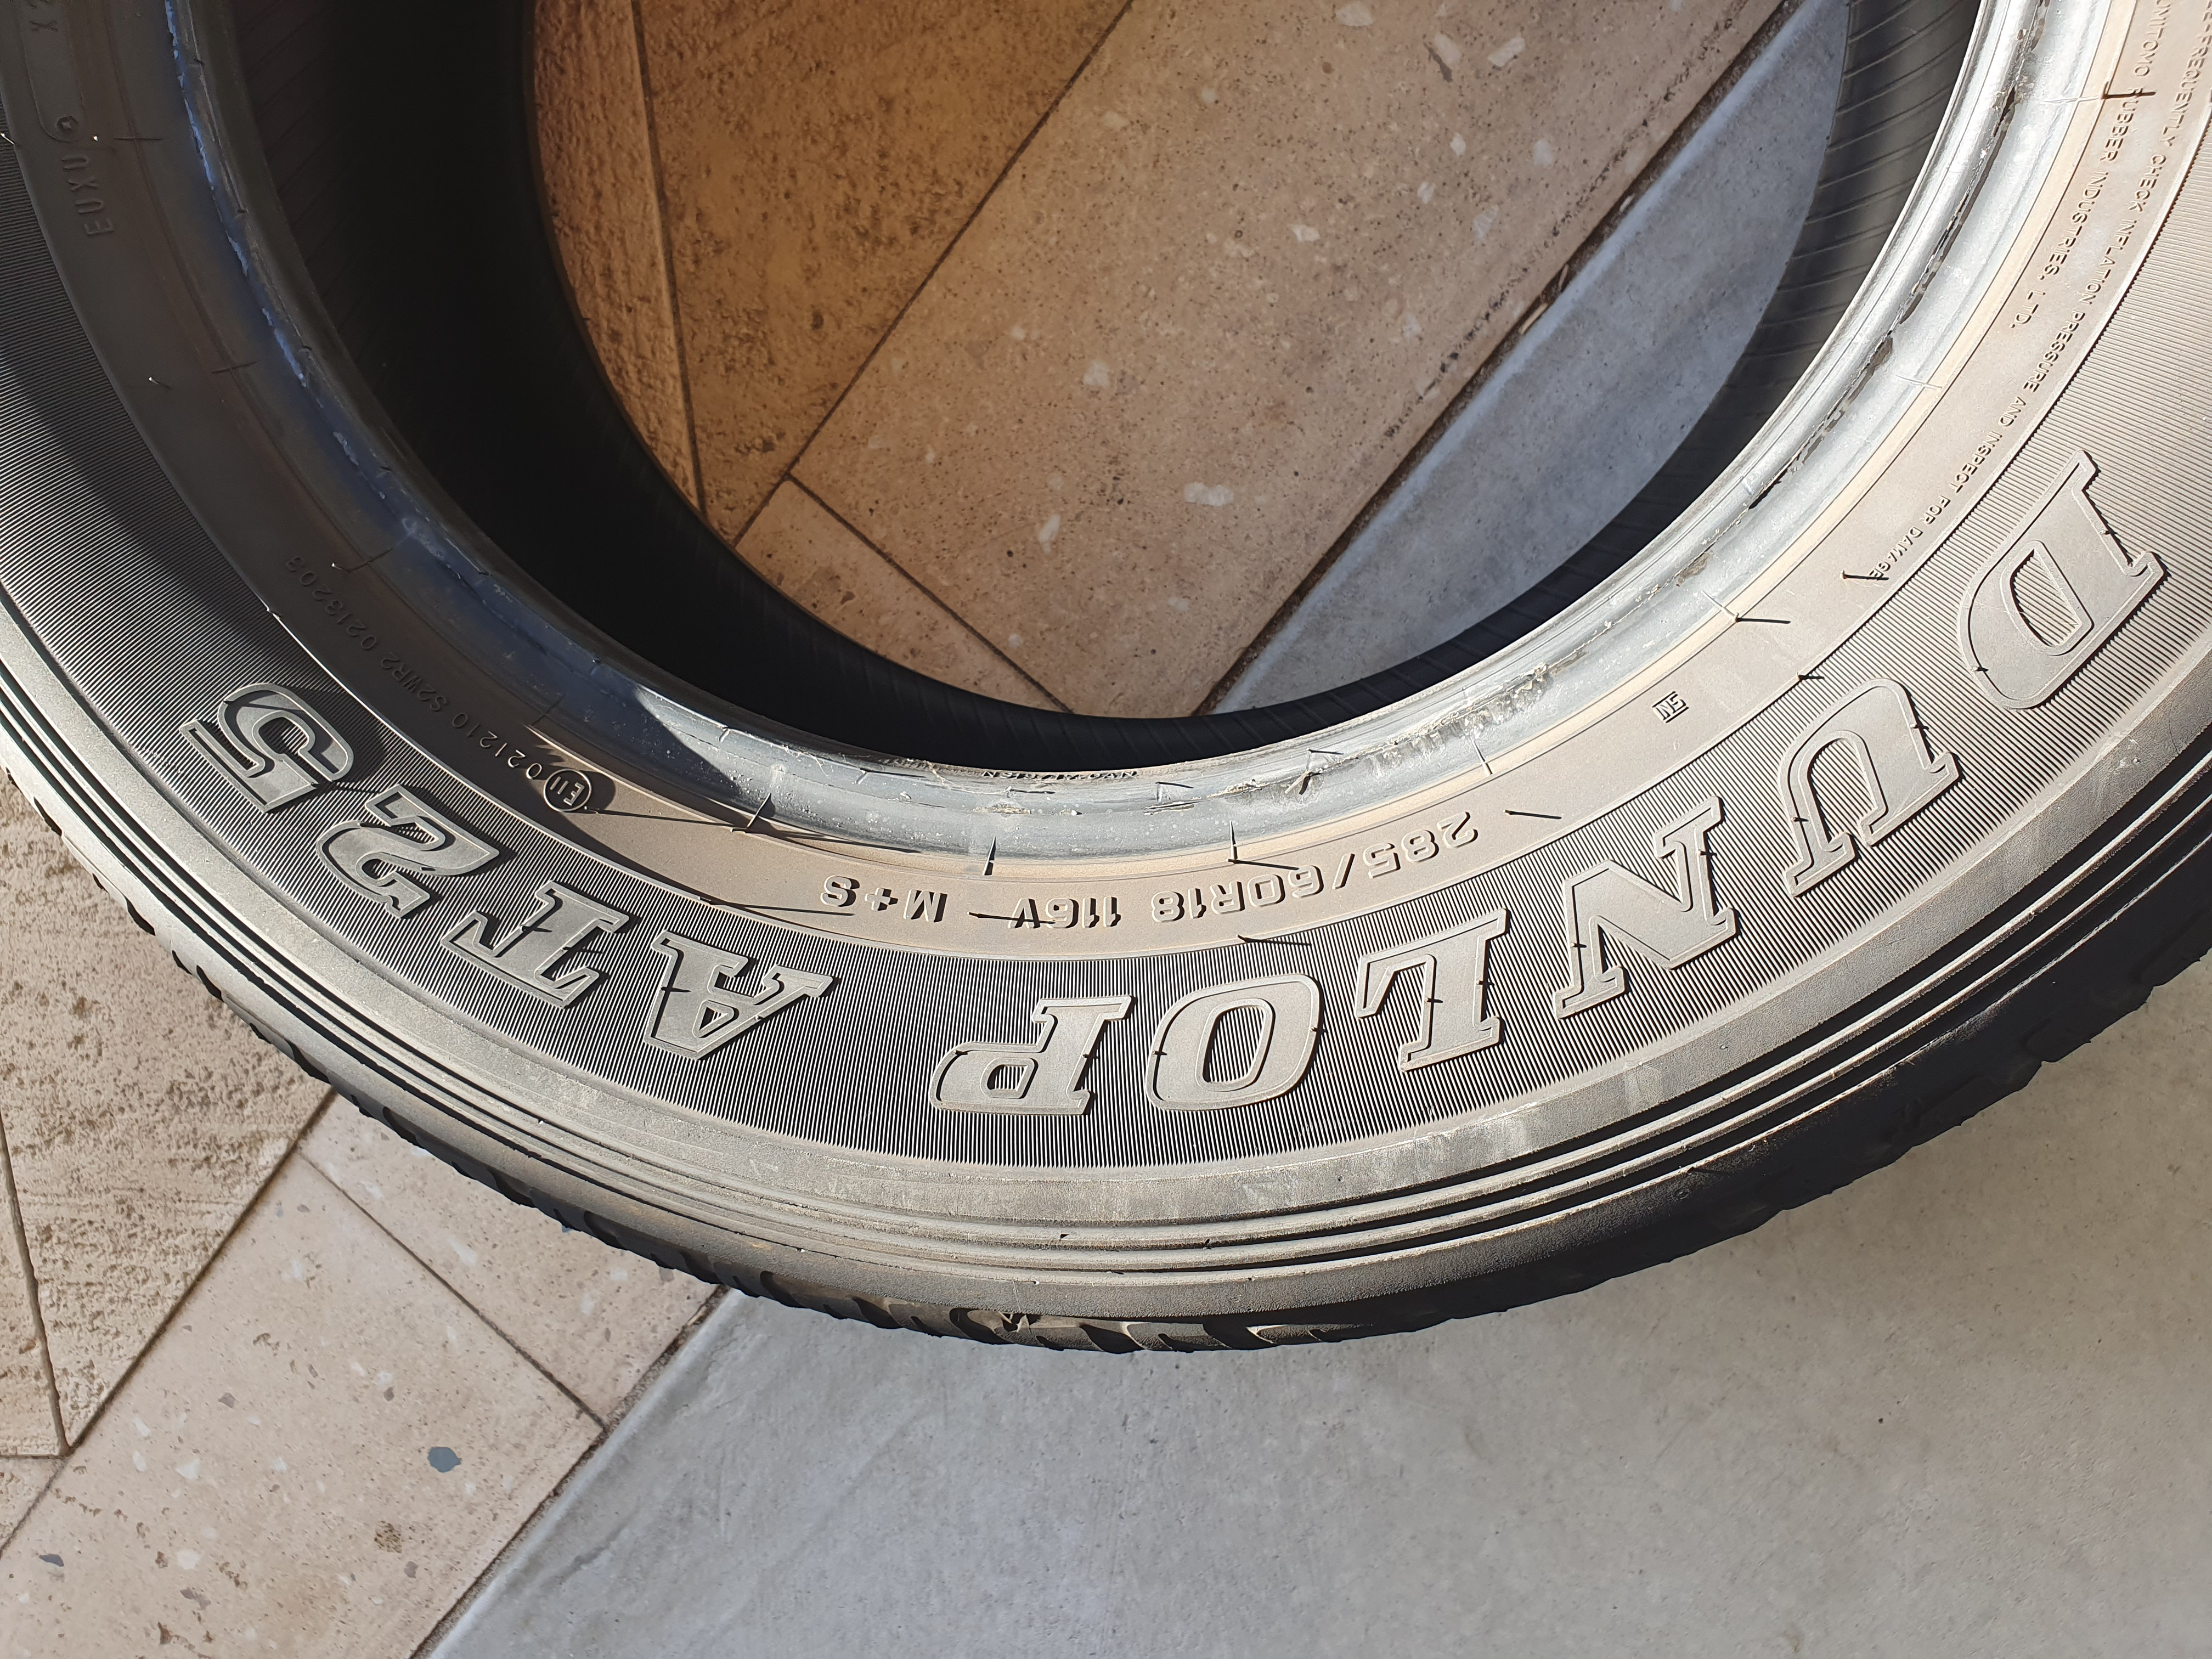 Dunlop AT25 285/60 R18